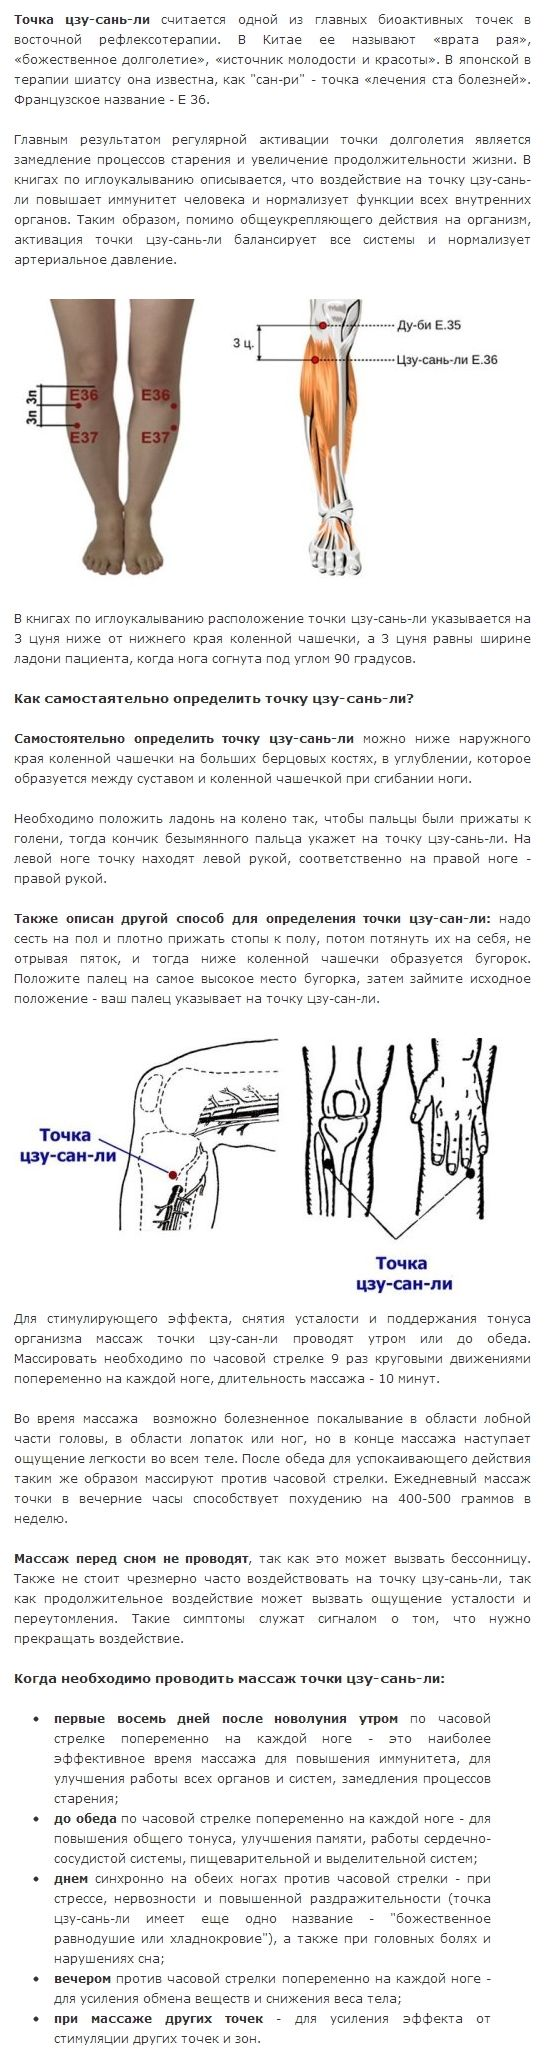 http://s6.uploads.ru/tn6xY.jpg